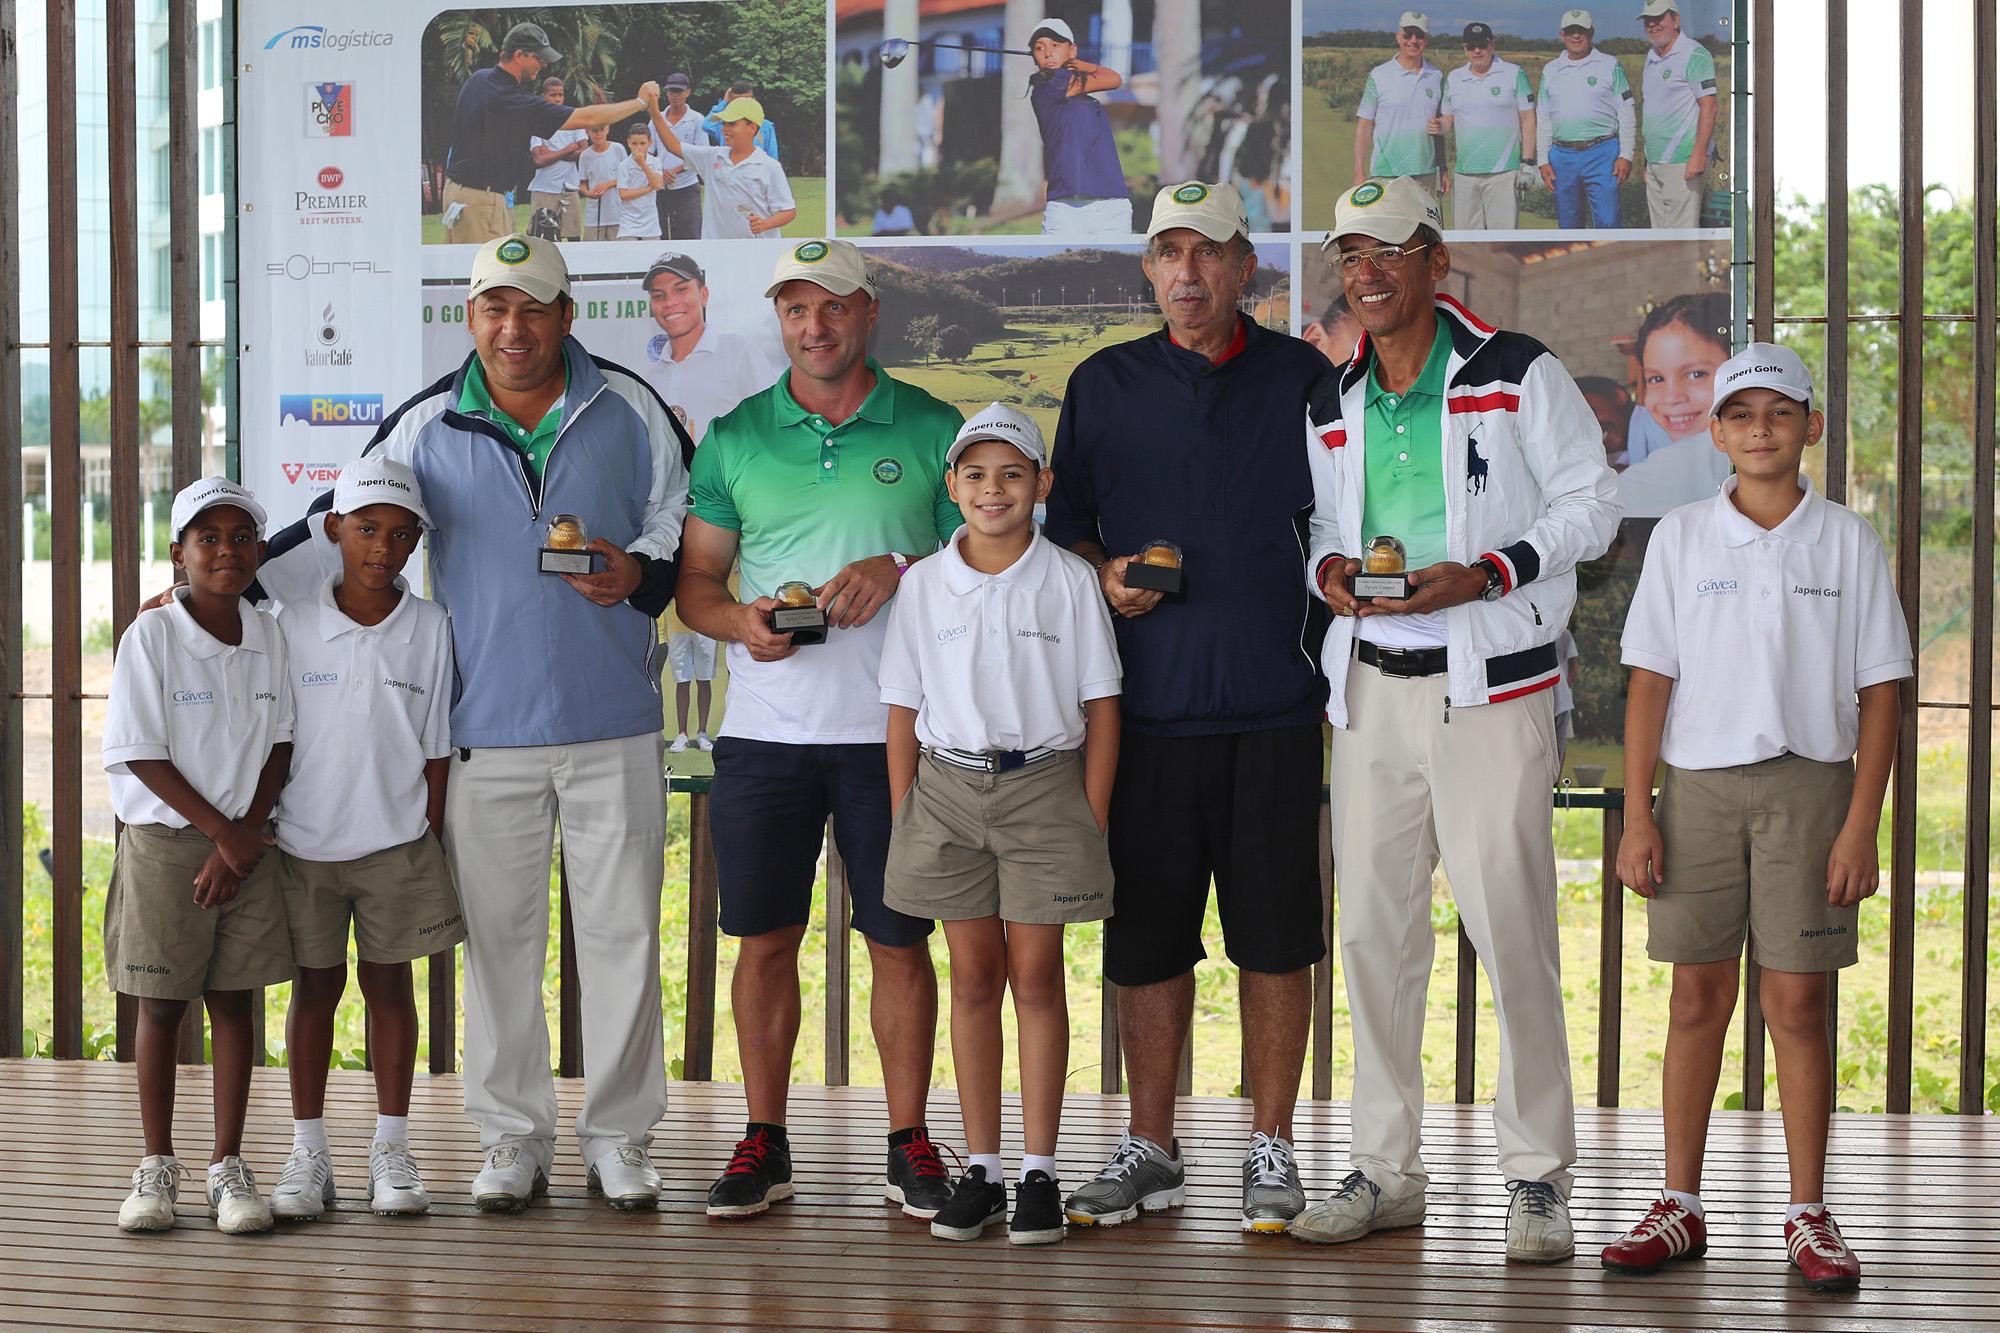 II Torneio Beneficente Japeri Golfe no Campo Olímpico